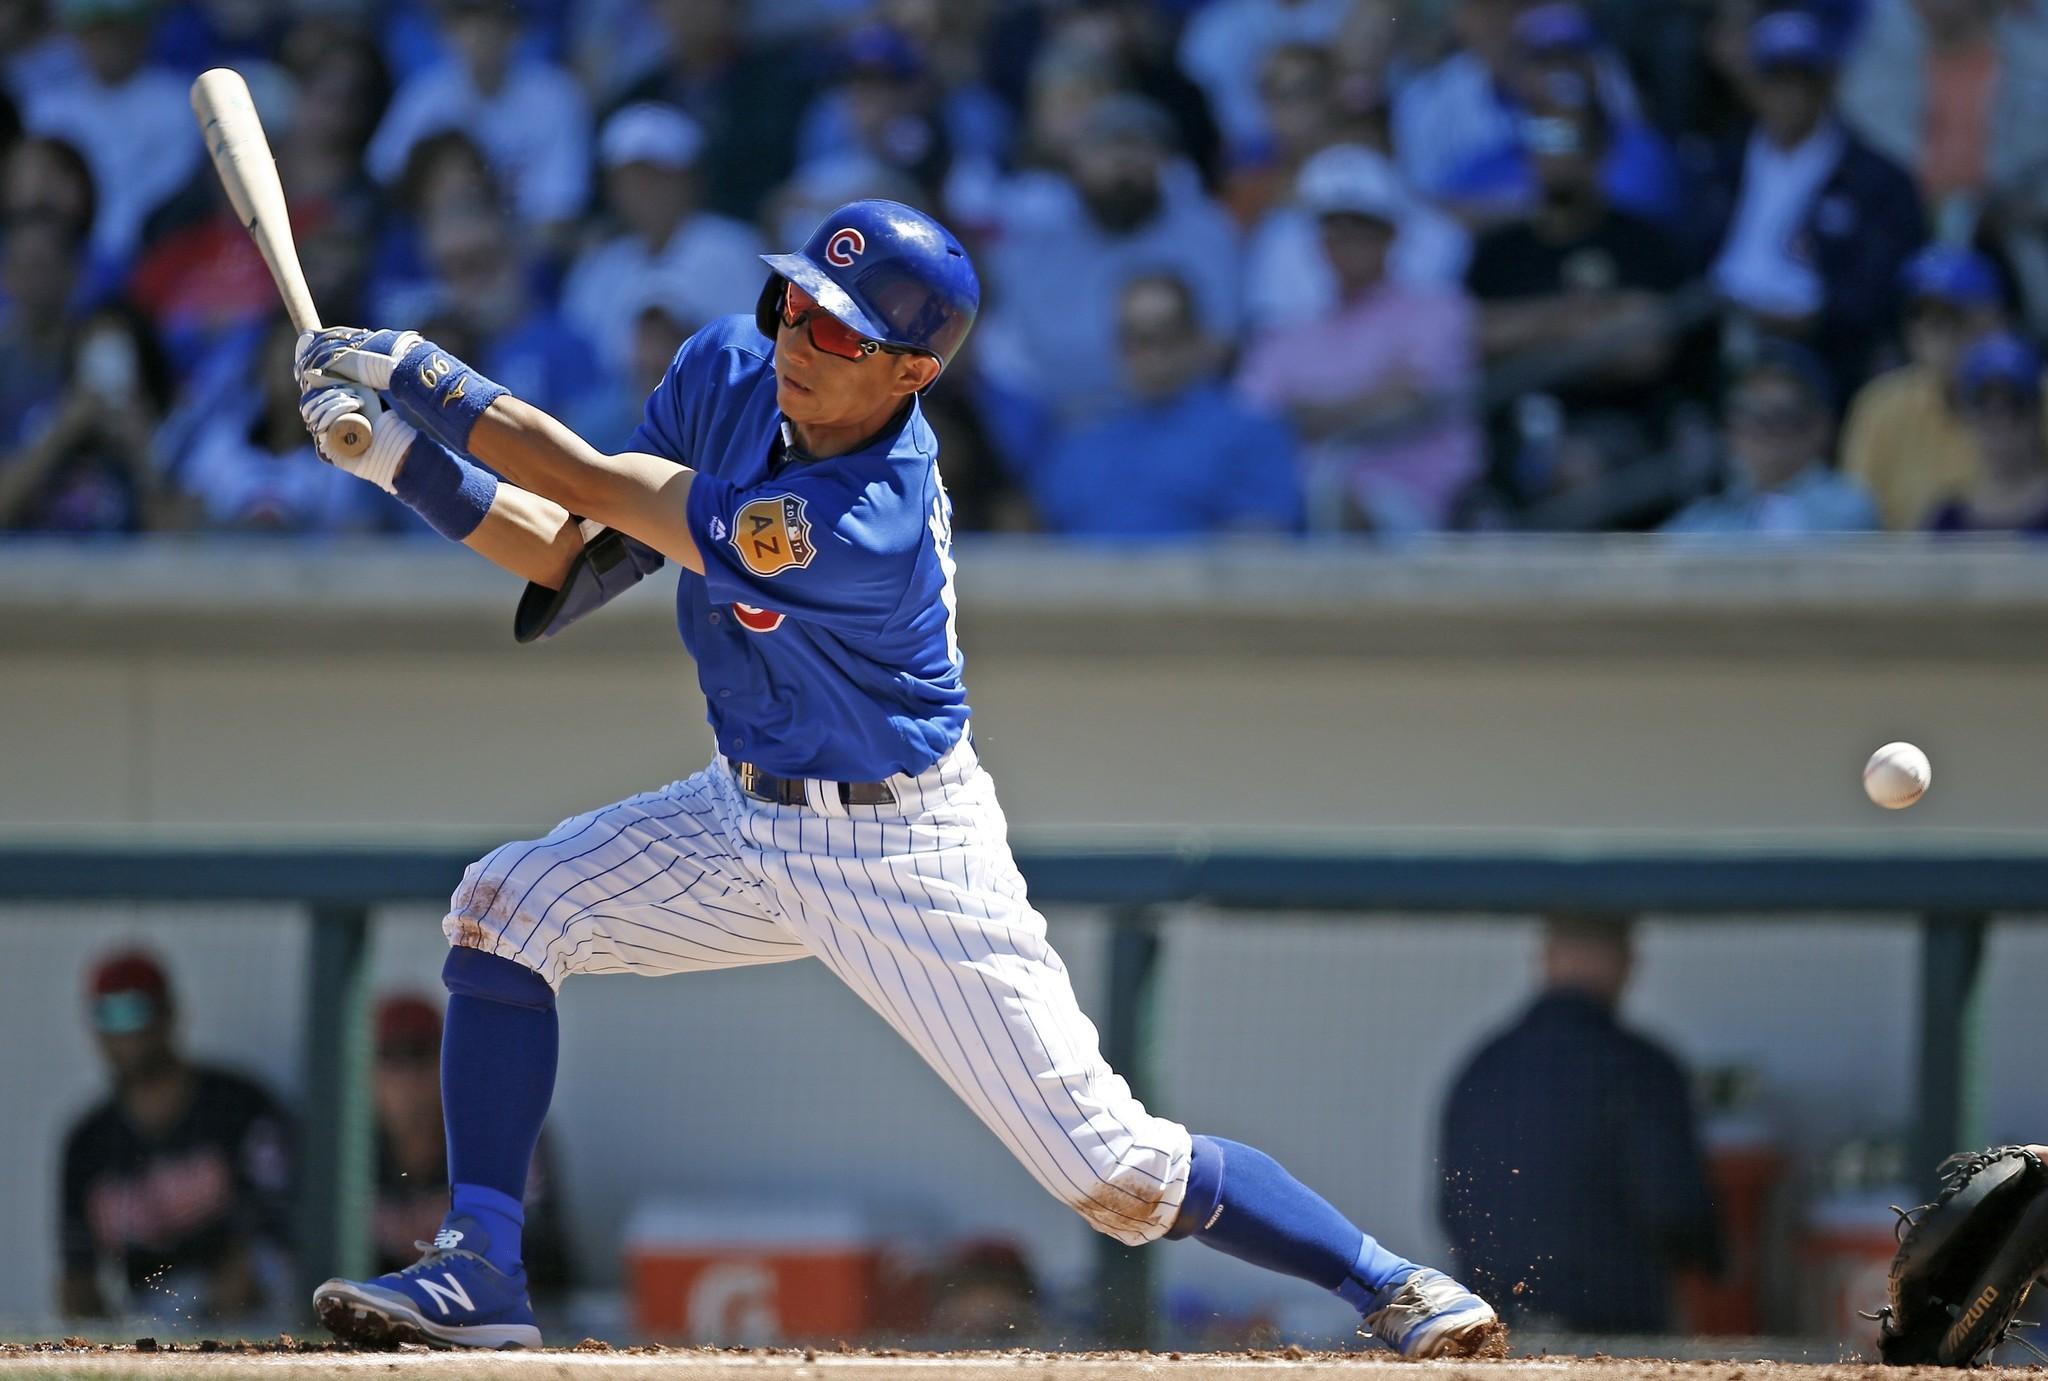 cubs hope to re-sign munenori kawasaki to minor league deal